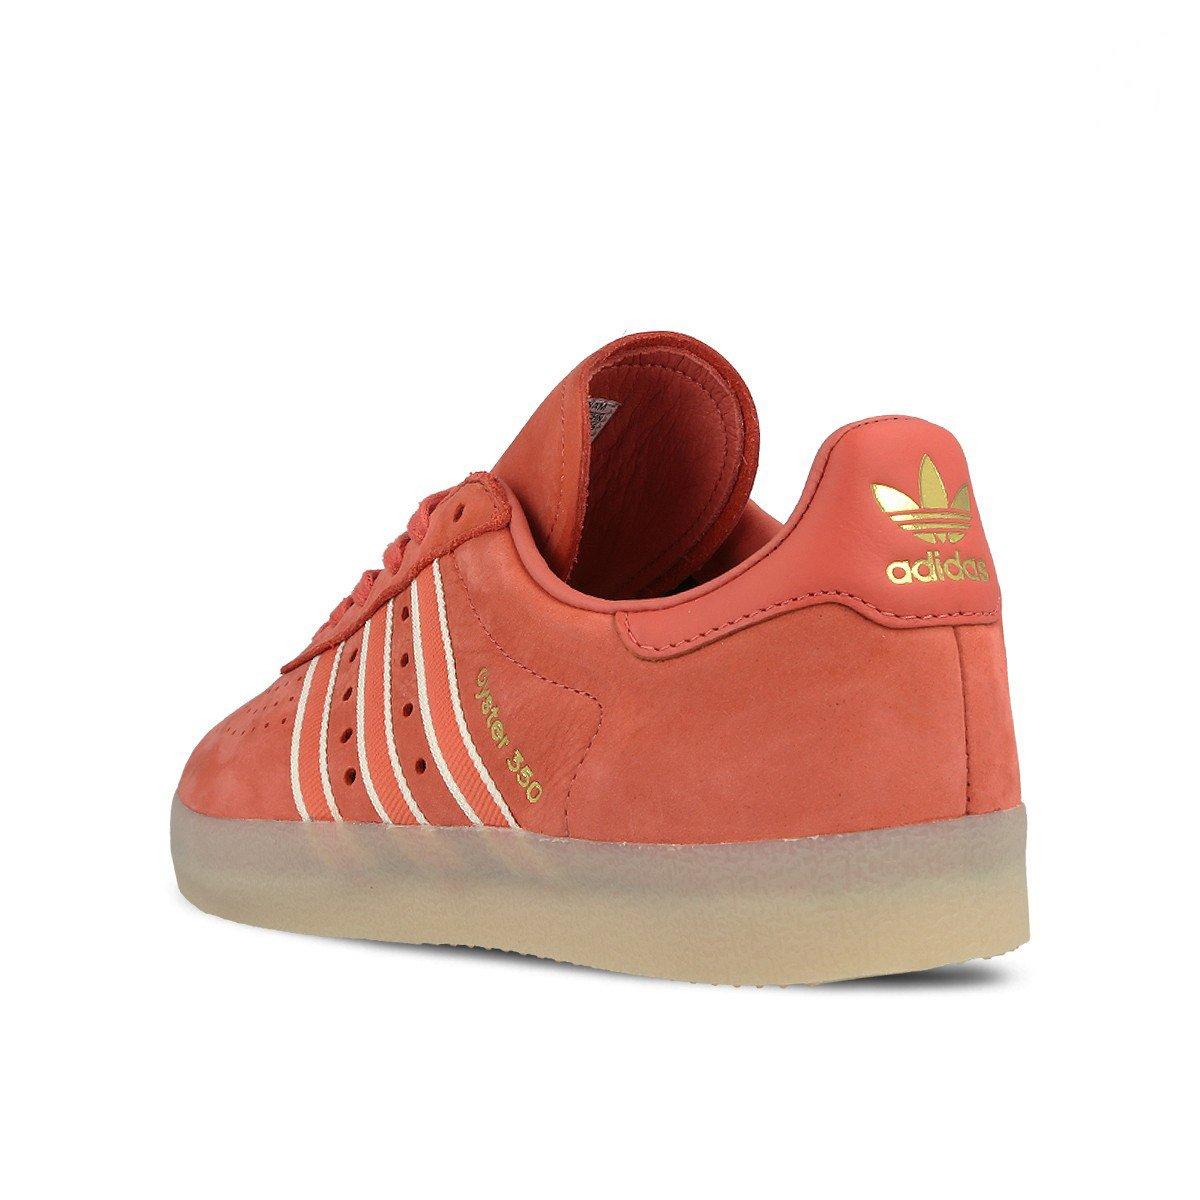 the best attitude 5a9fd 271ba Amazon.com  adidas Men Oyster Holdings 350 (redTrace ScarletChalk  WhiteMetallic Gold)  Fashion Sneakers